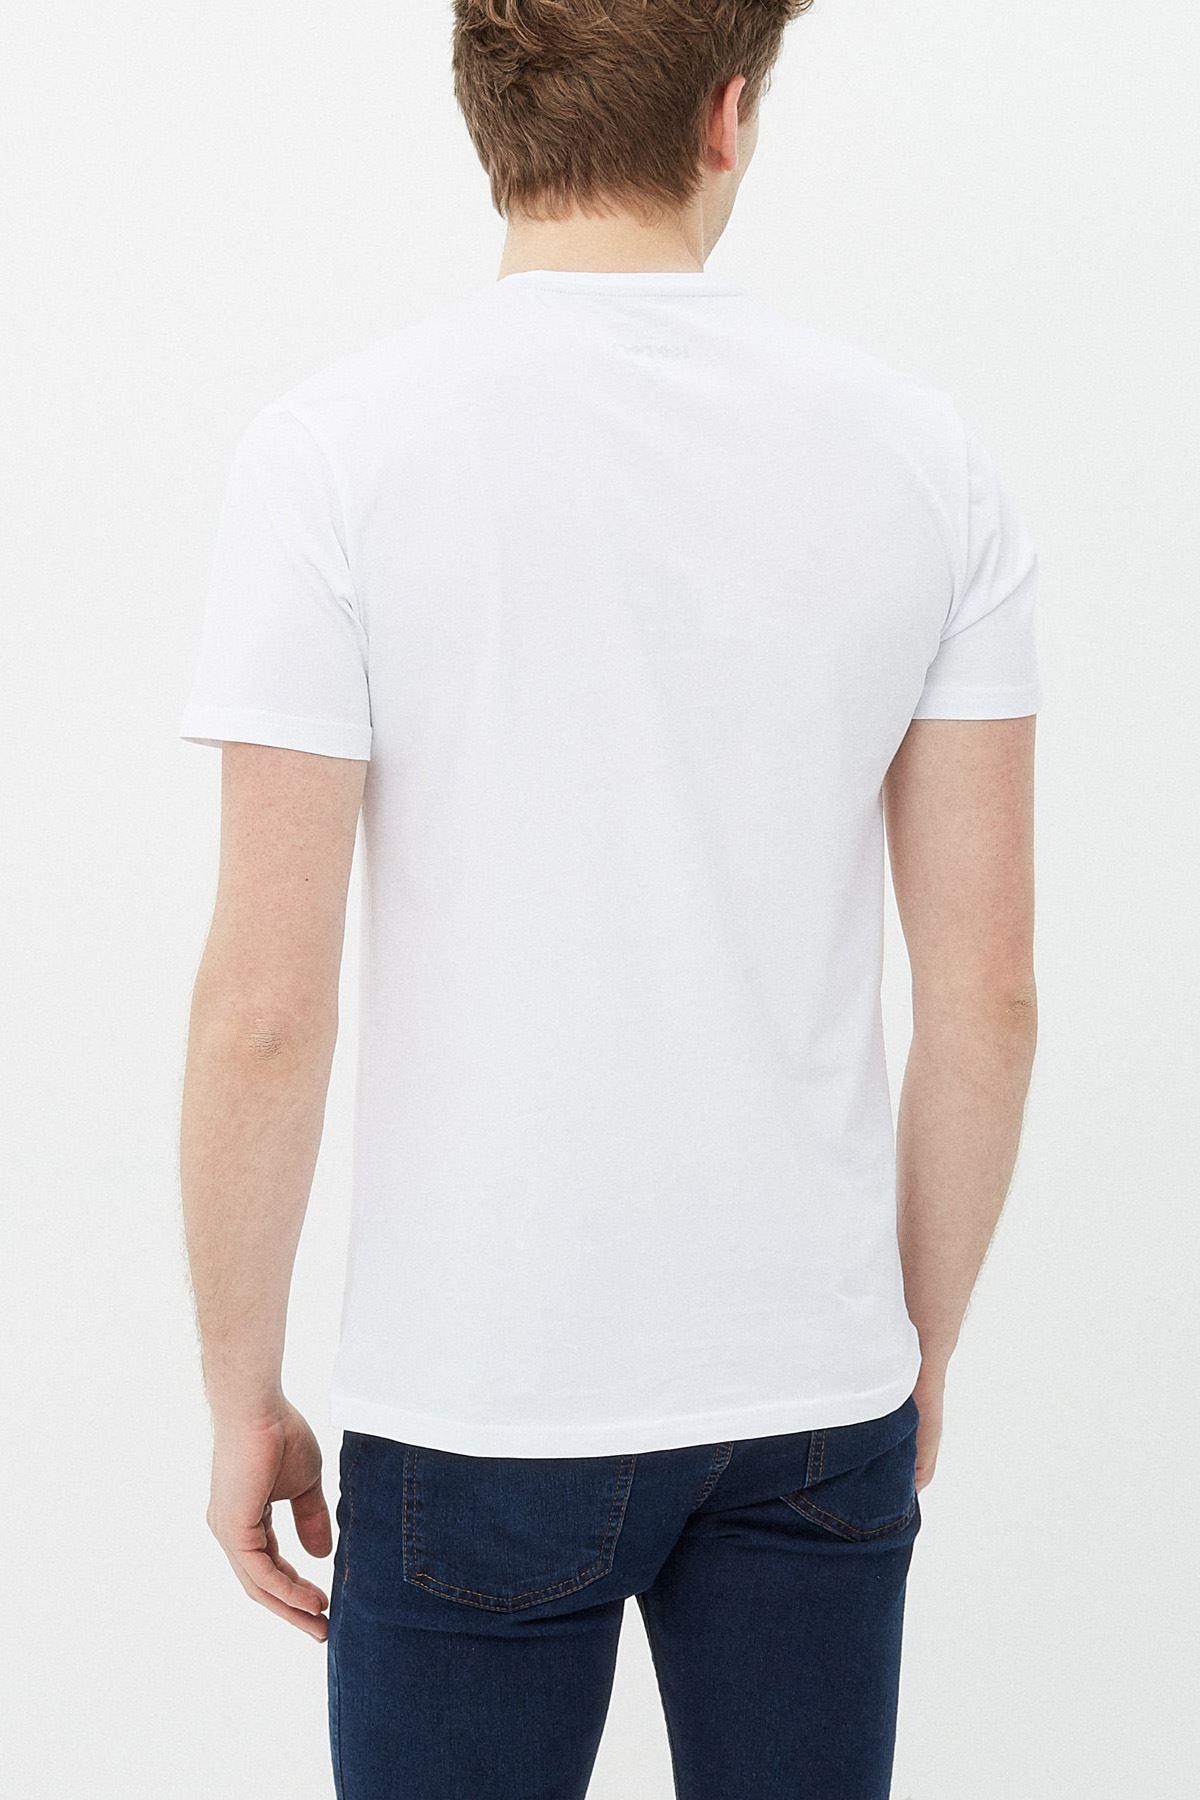 Naruto Anime 02 Beyaz Erkek Tshirt - Tişört